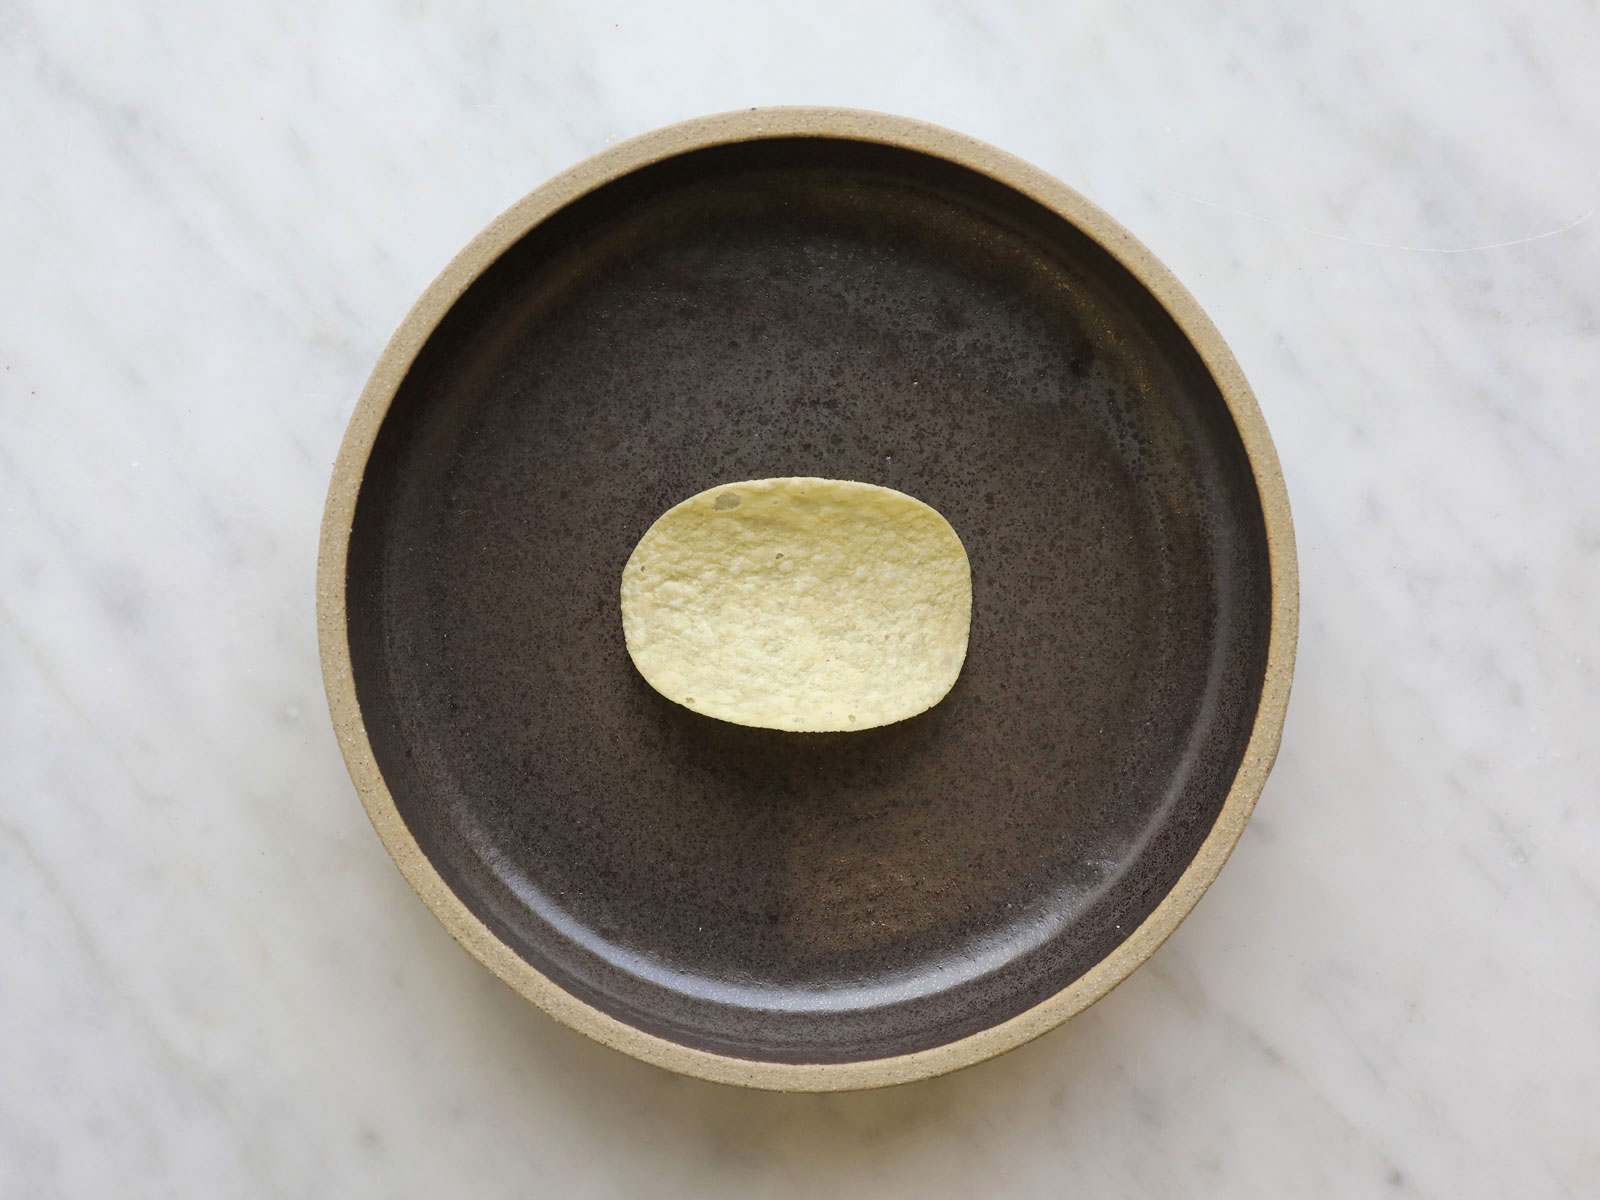 Original Reduced Fat Pringles